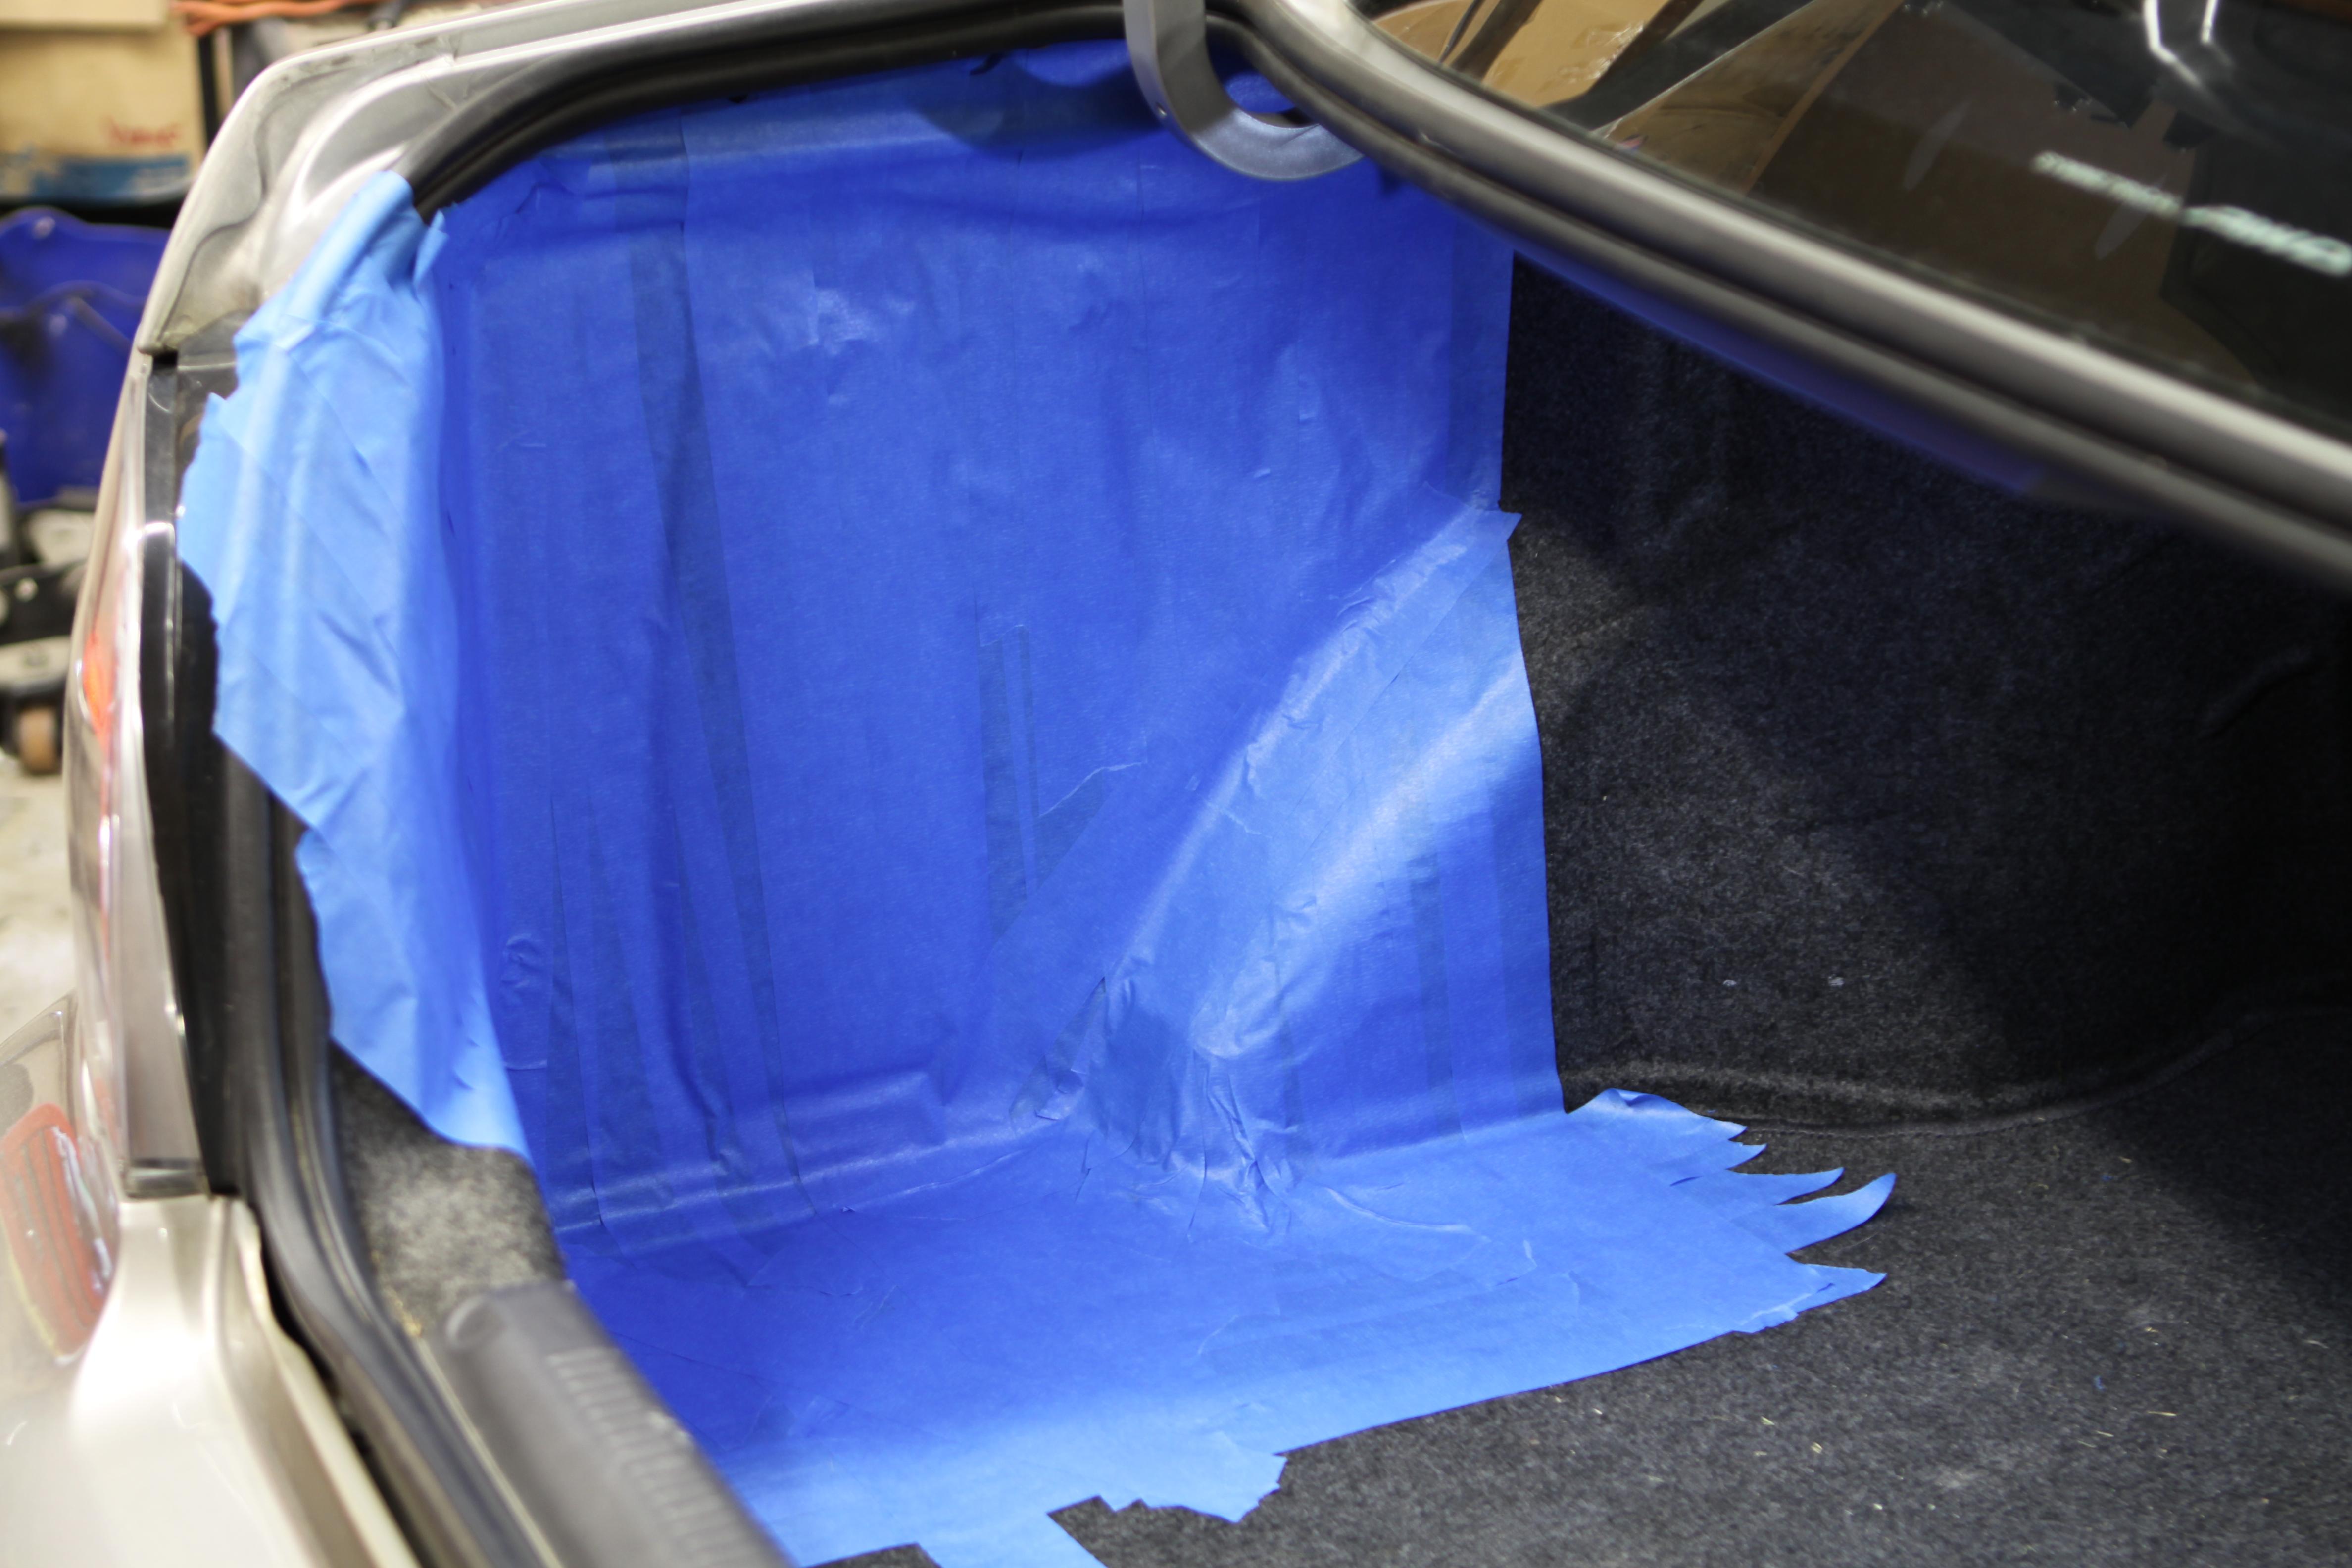 Customer S Fiberglass 10 Sub Enclosure For Subaru Sti